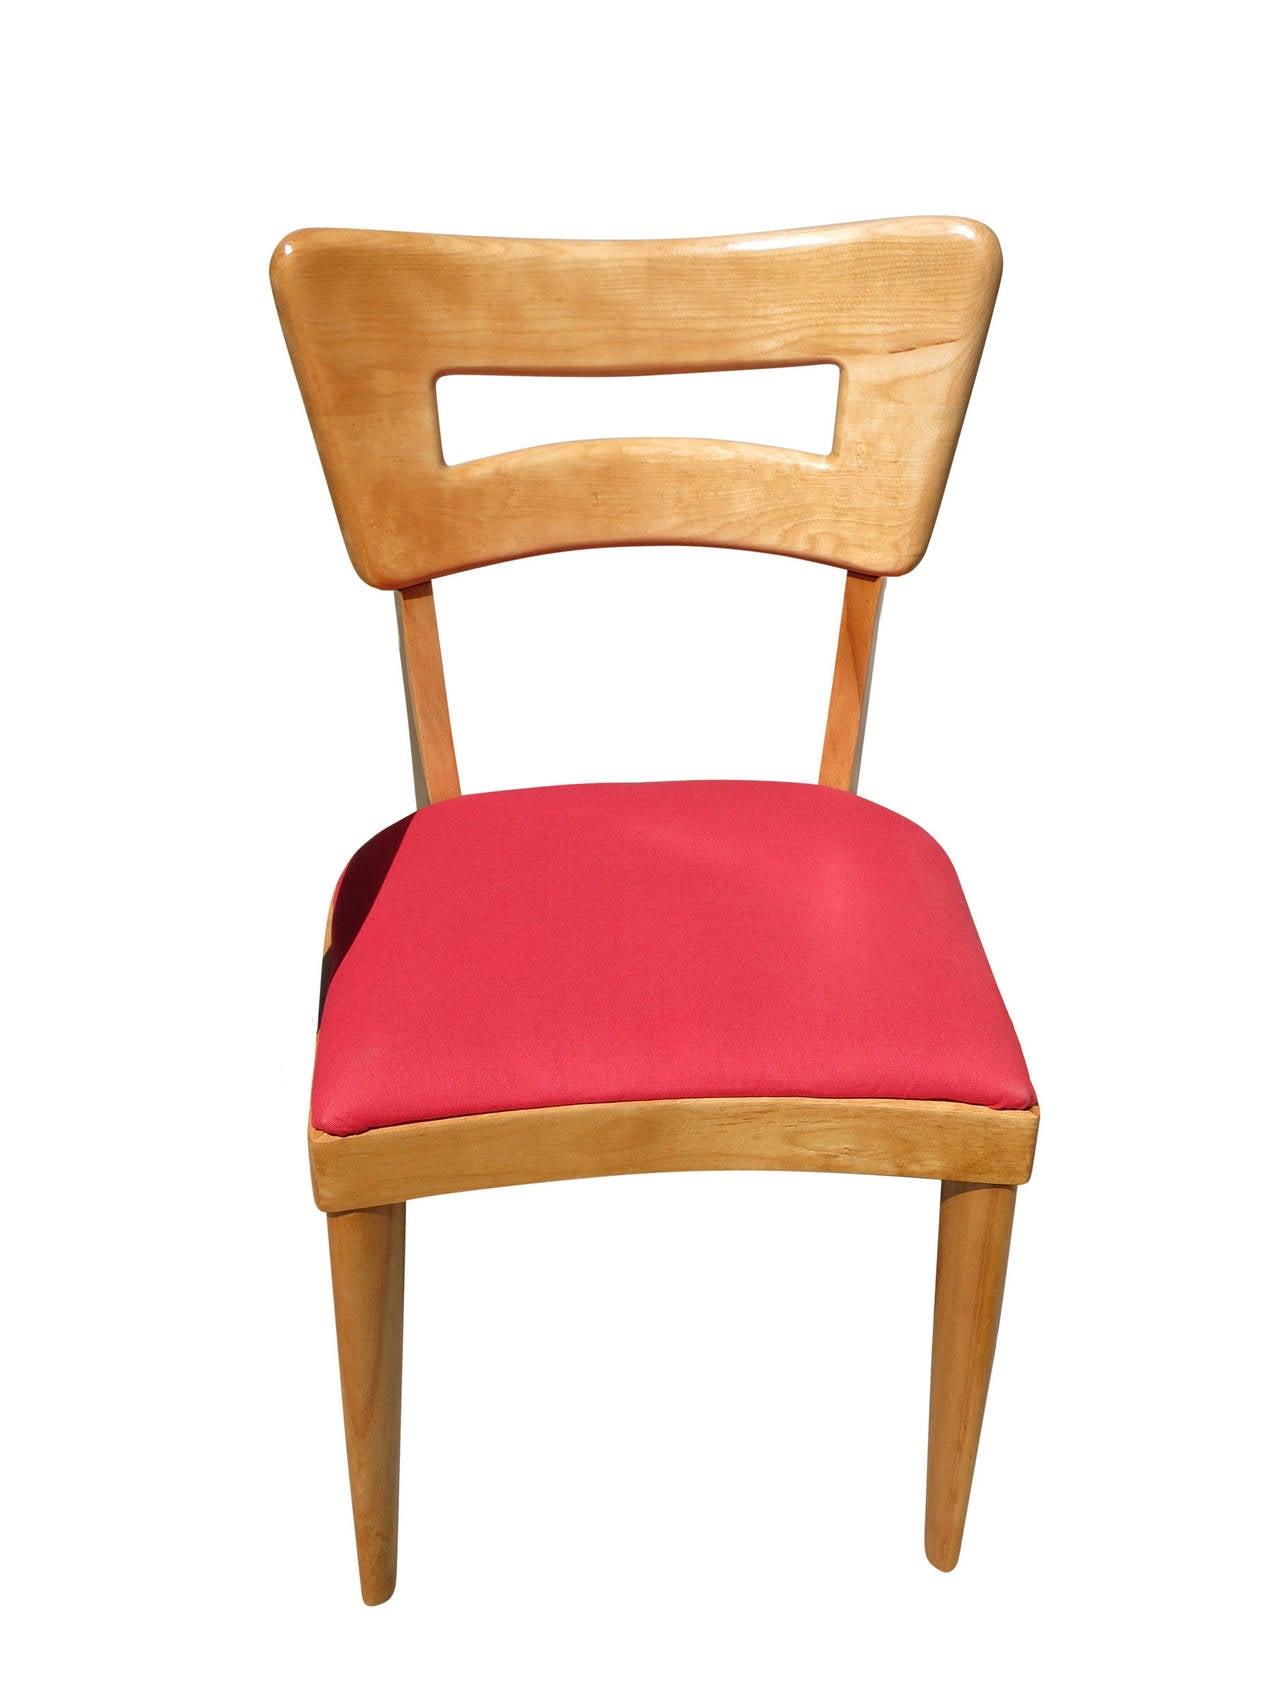 heywood wakefield dogbone chairs swing chair bangkok m154 quotdogbone quot dining set of six